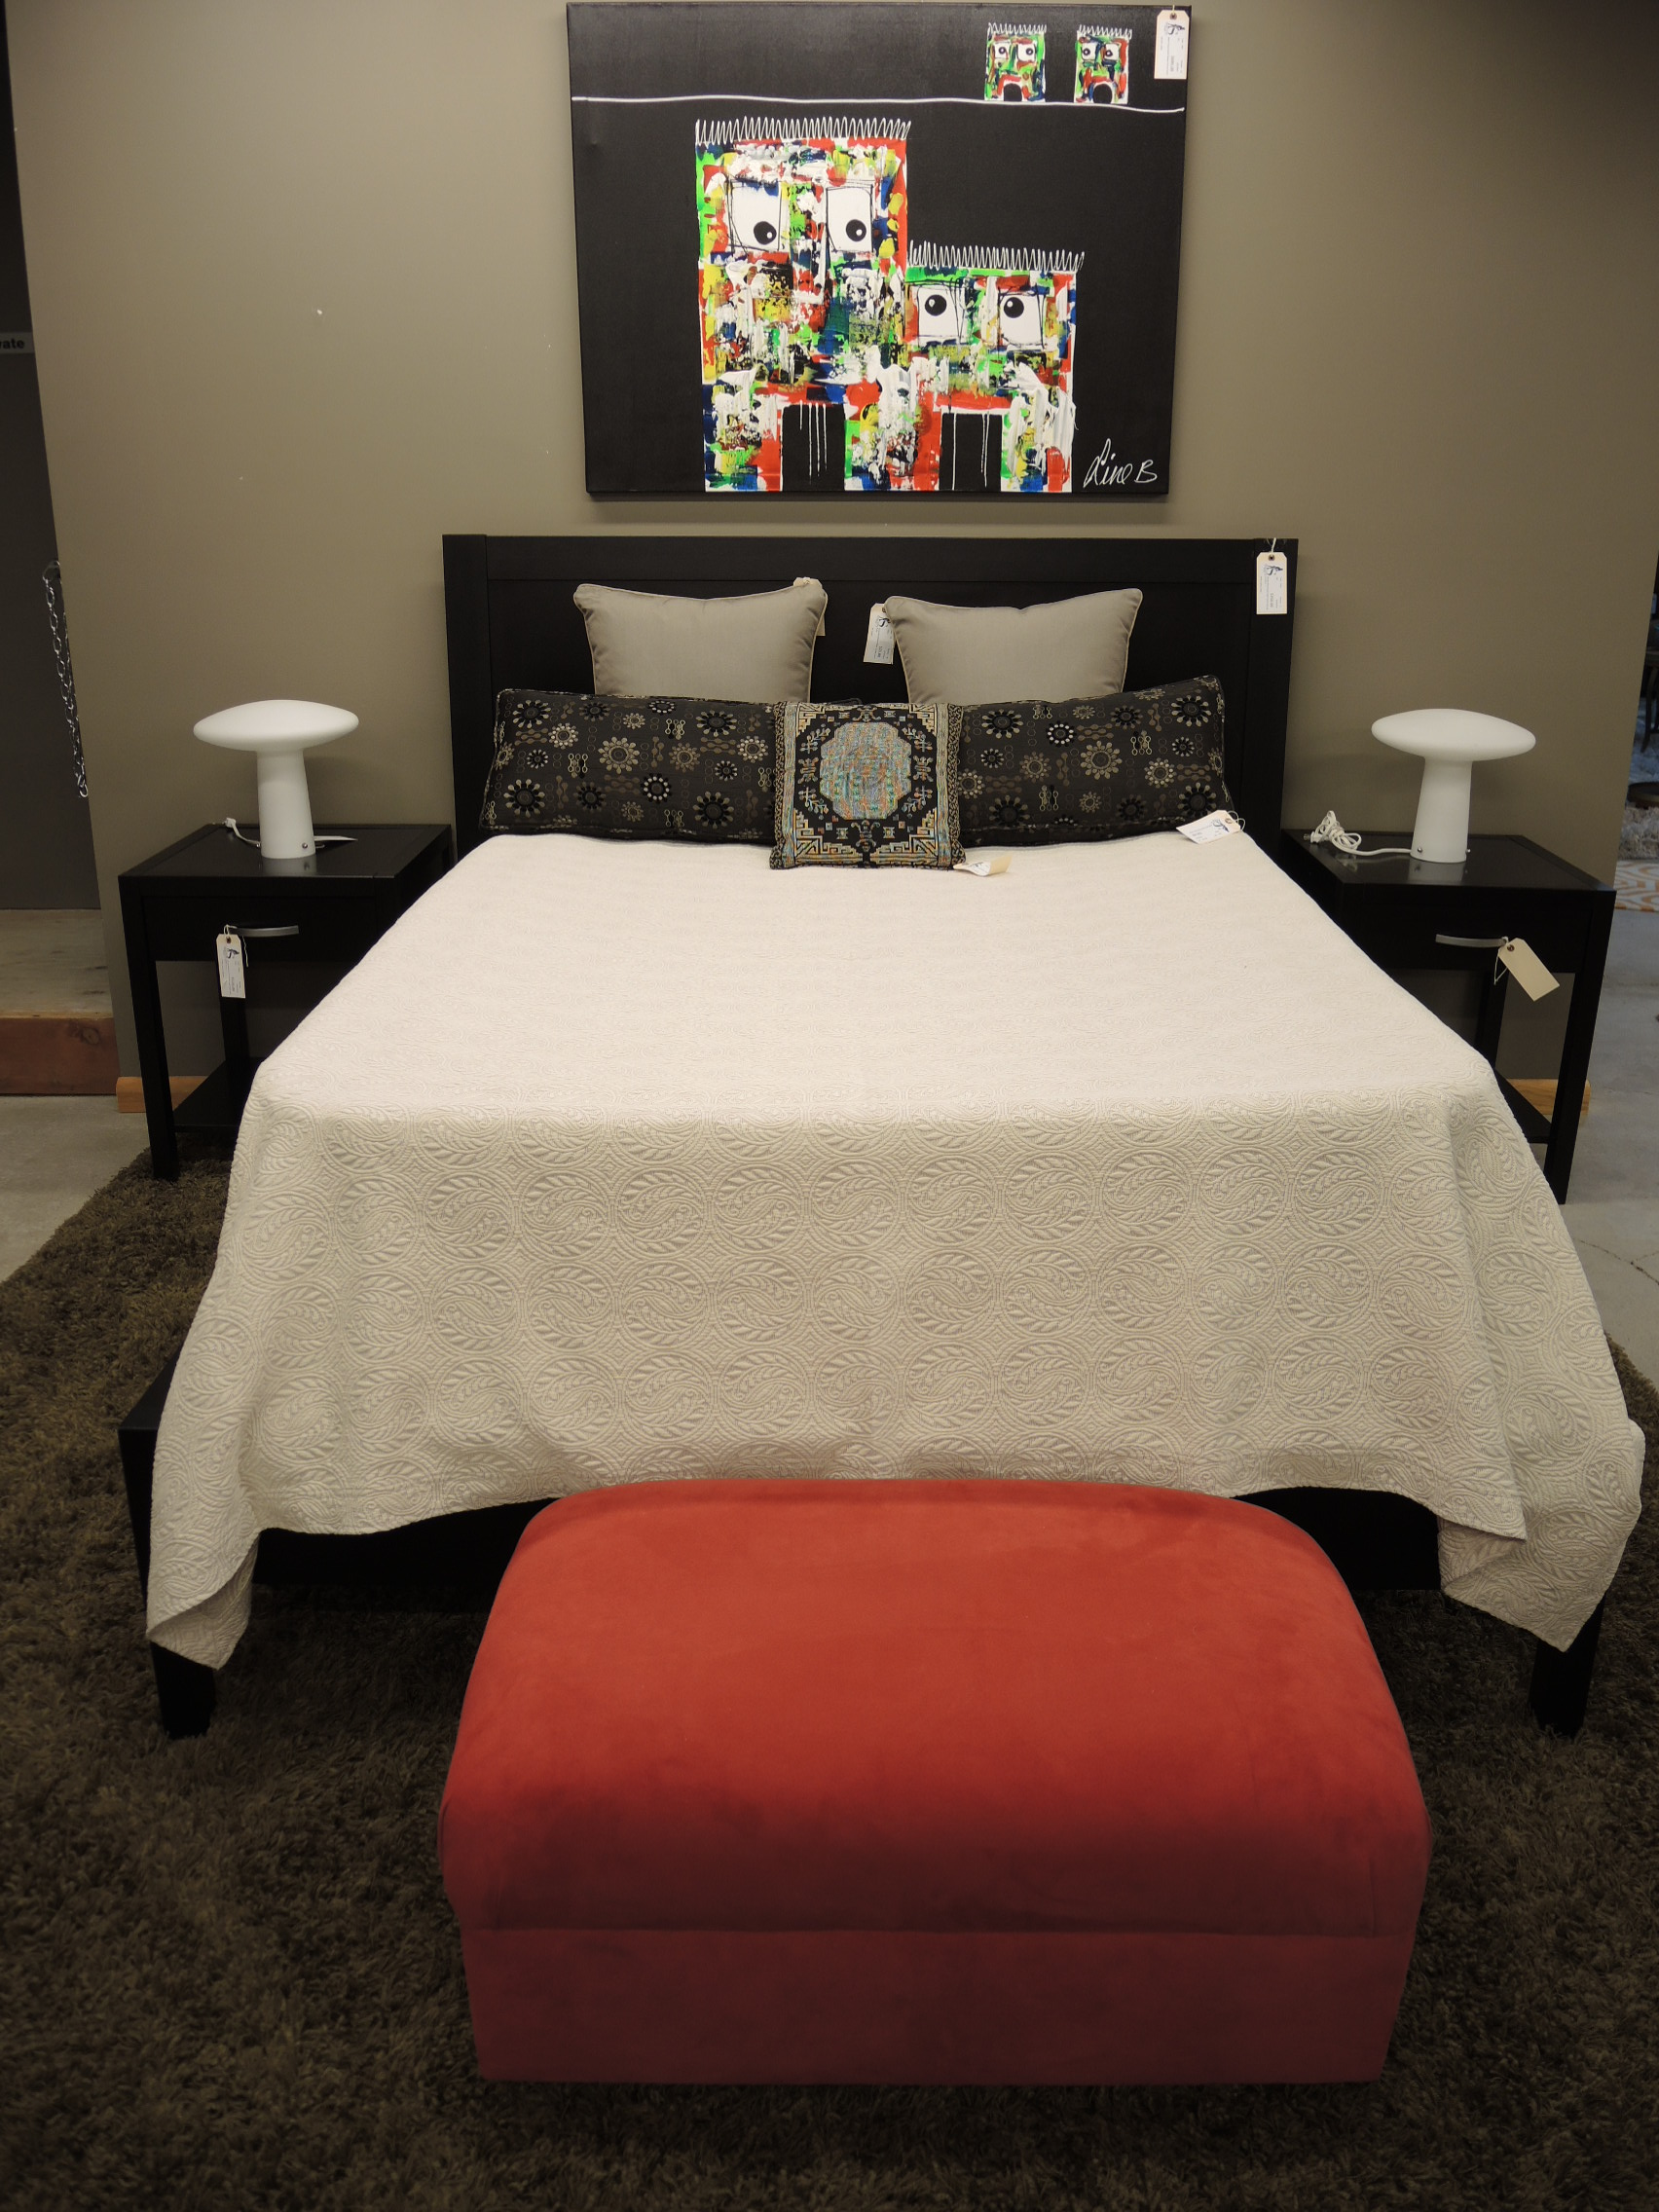 Portland Bedroom Furniture Hip Furniture Seams To Fit Home